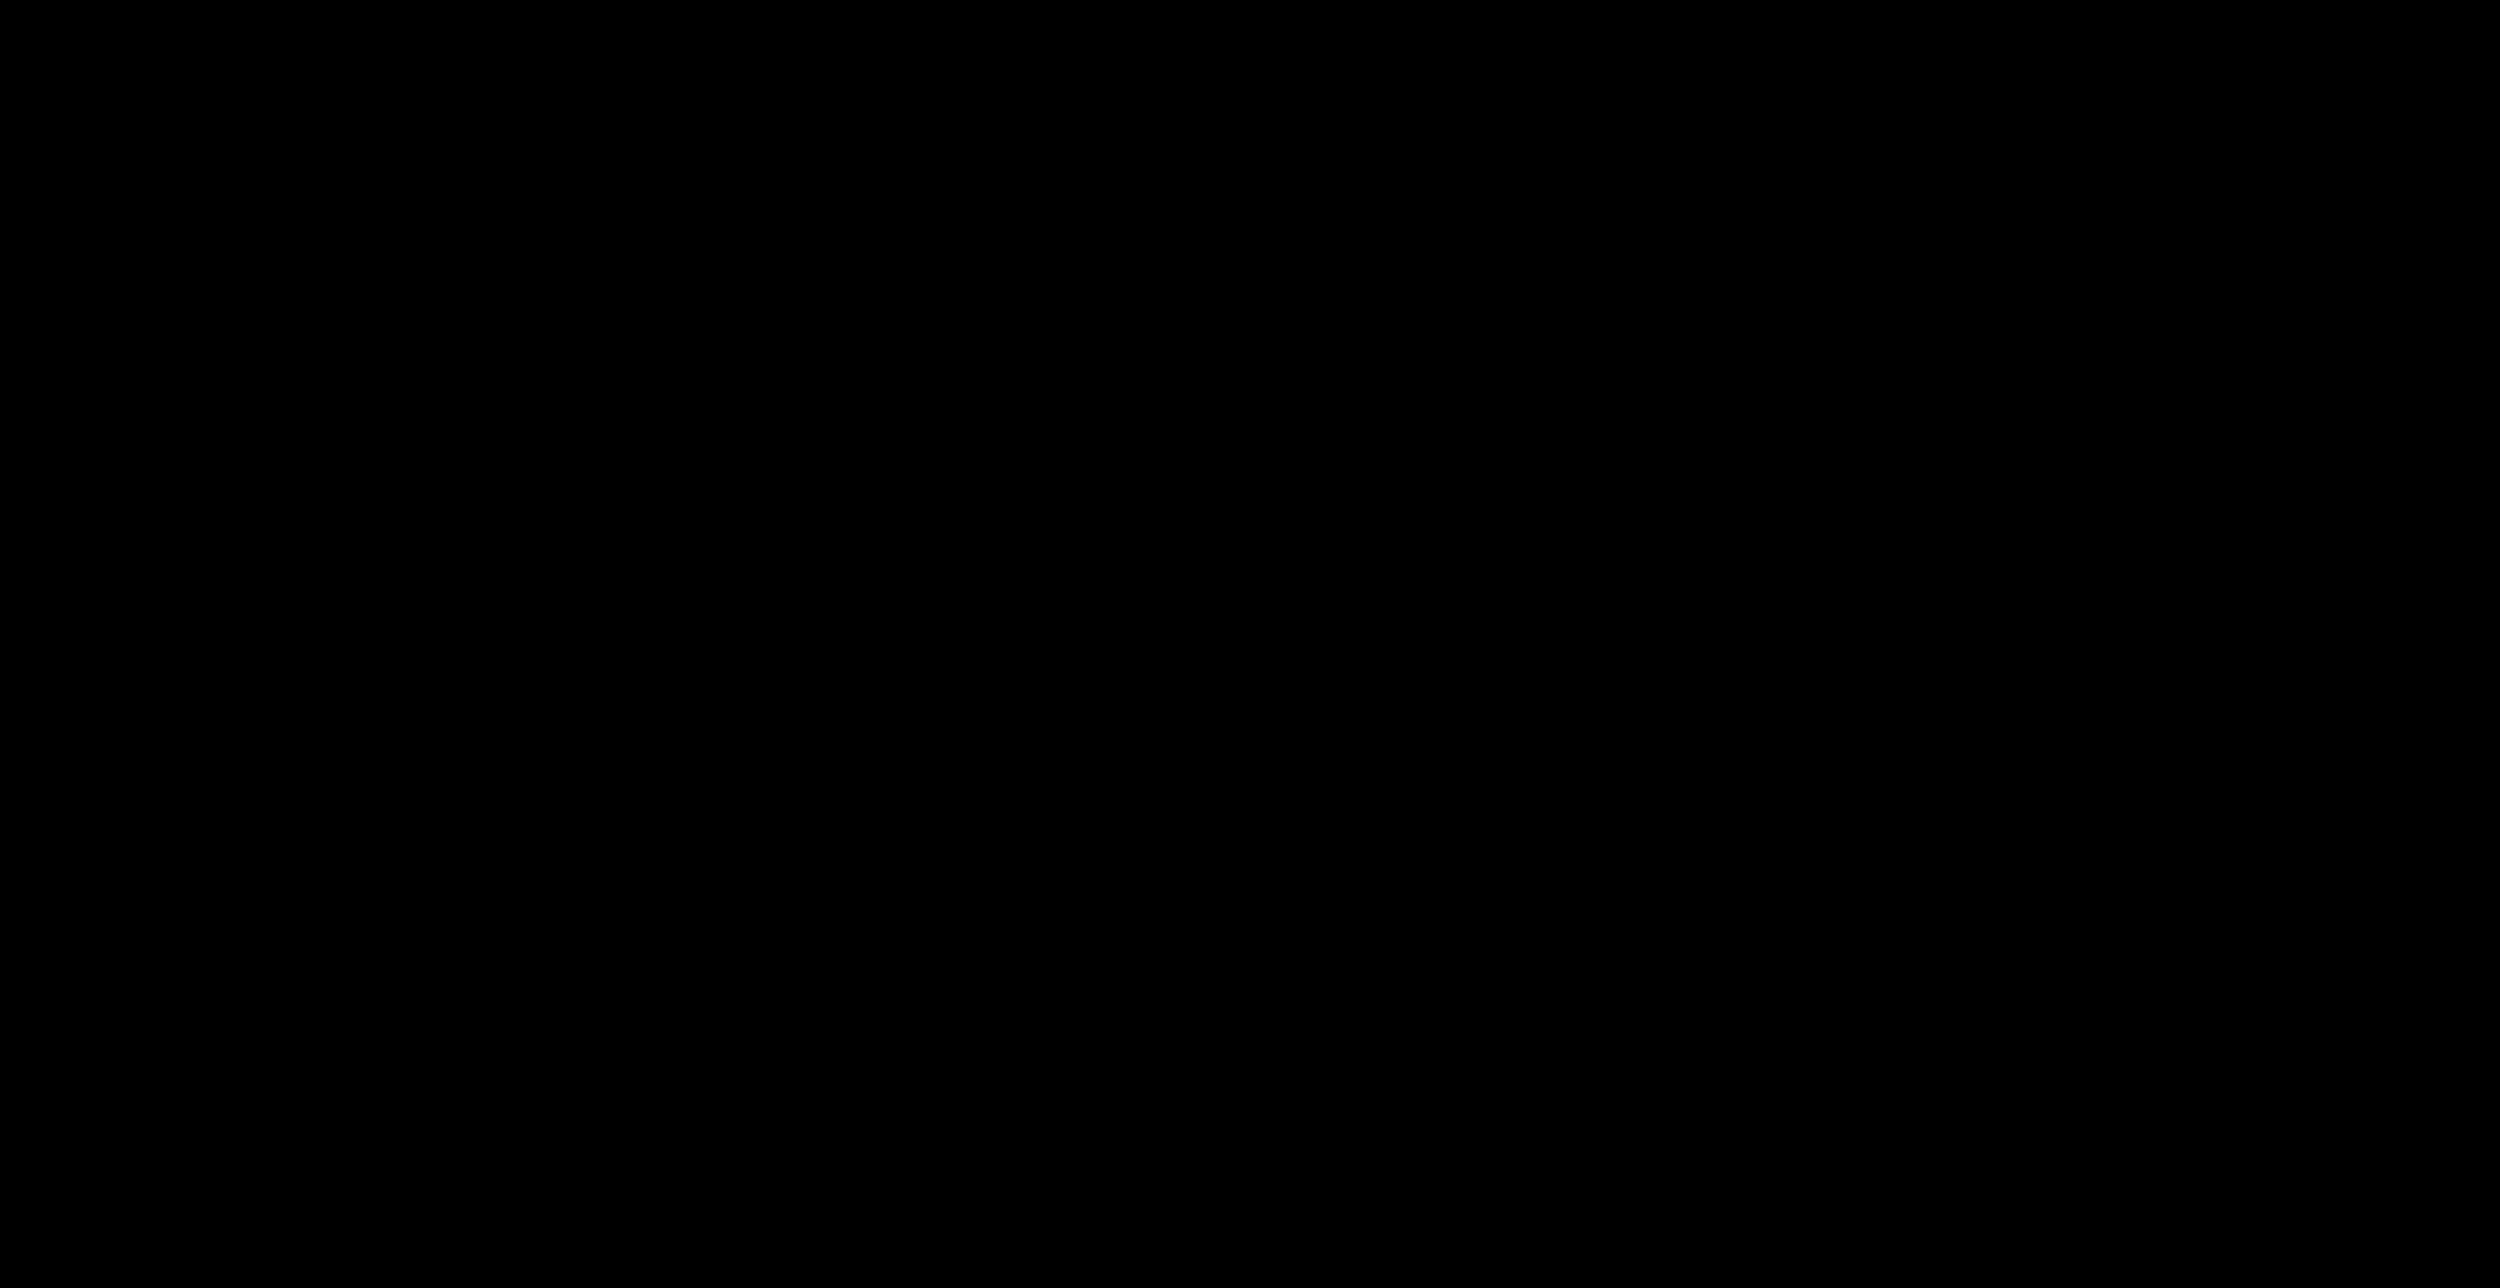 logo_ohcho - kyohei okada.png